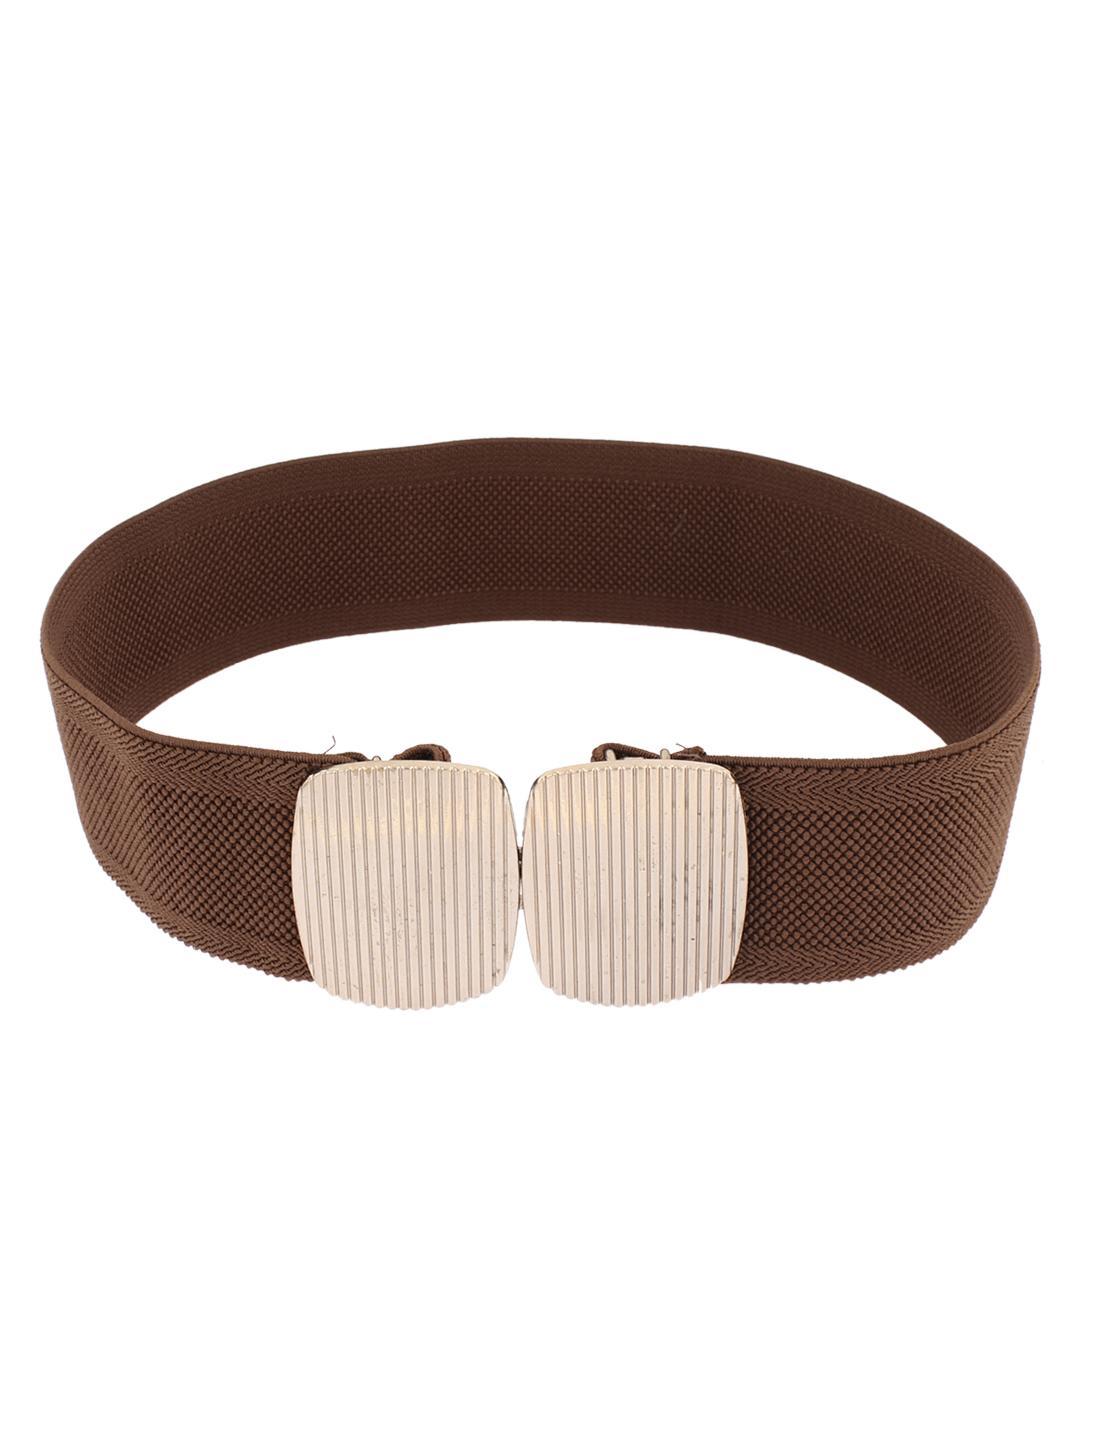 Women Lady Faux Leather Waistband Waist Belt Strap